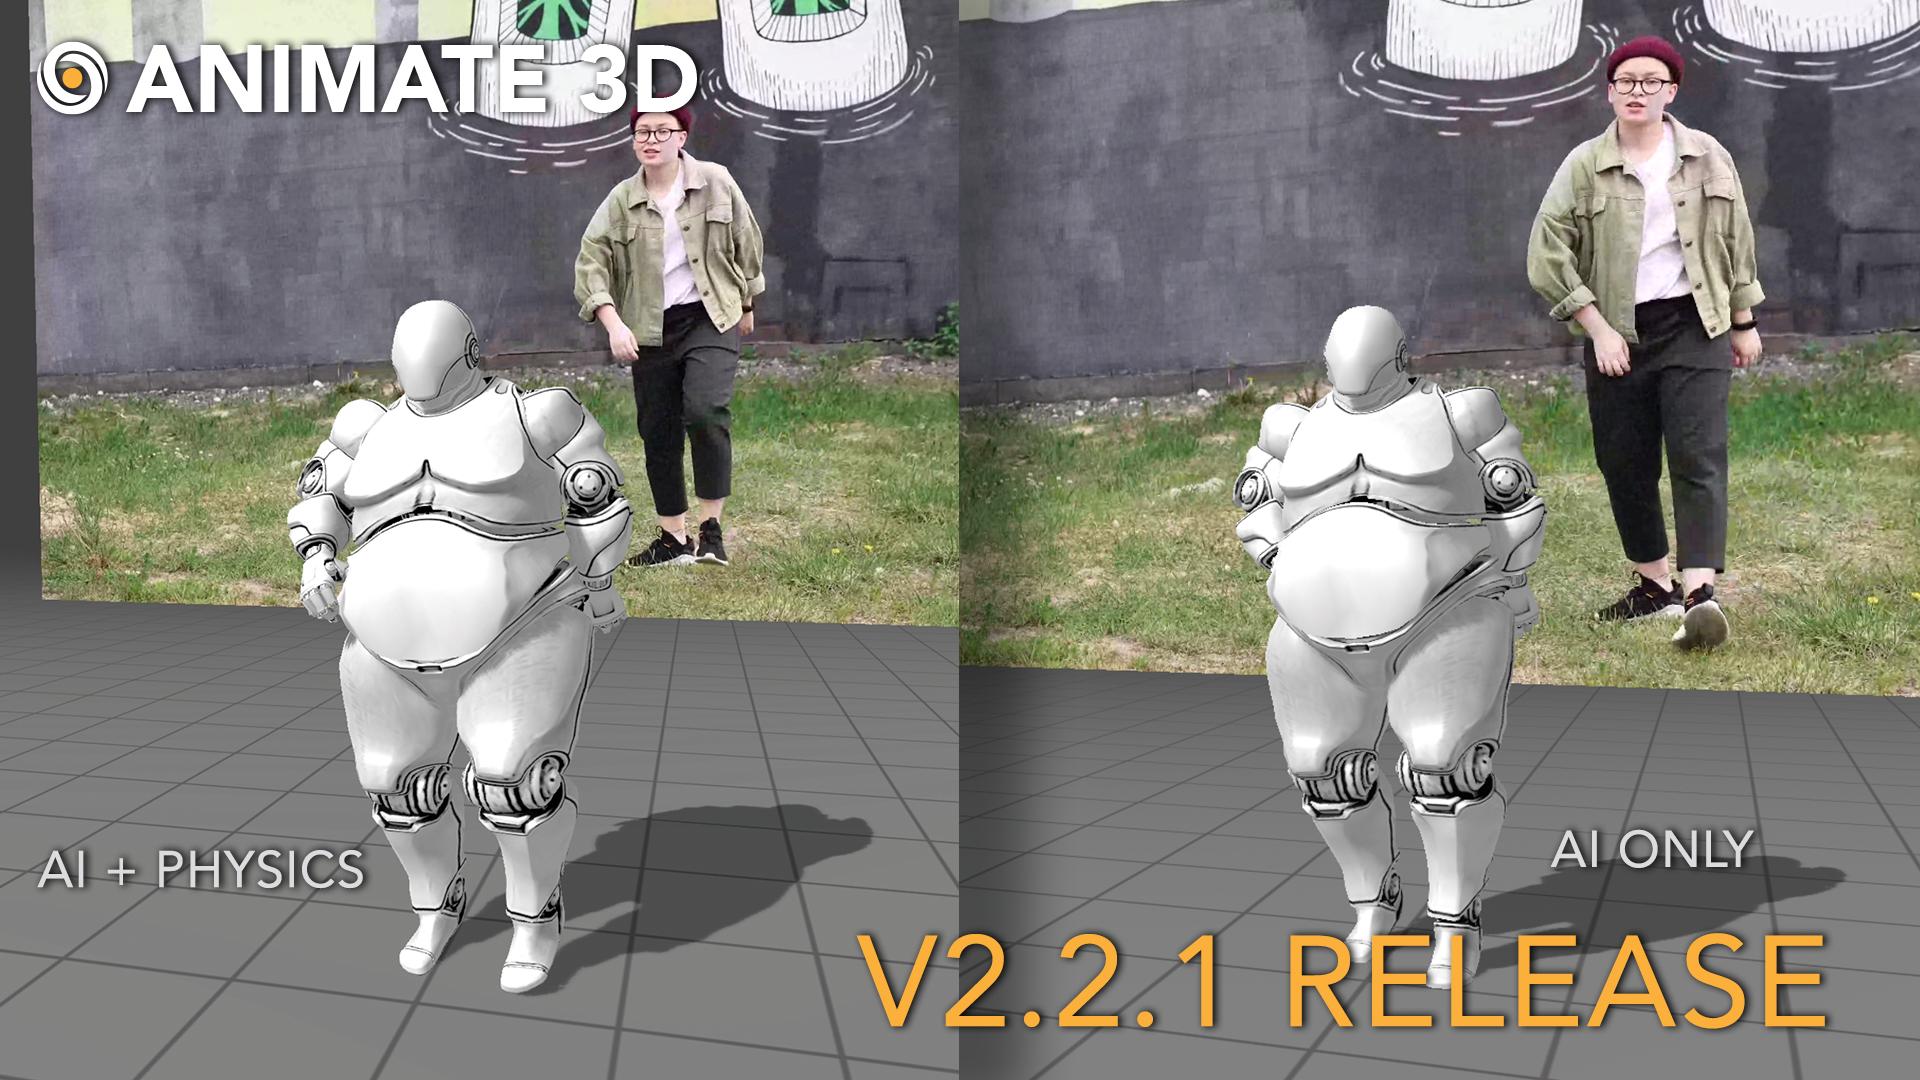 Animate 3D - V2.2.1 Release